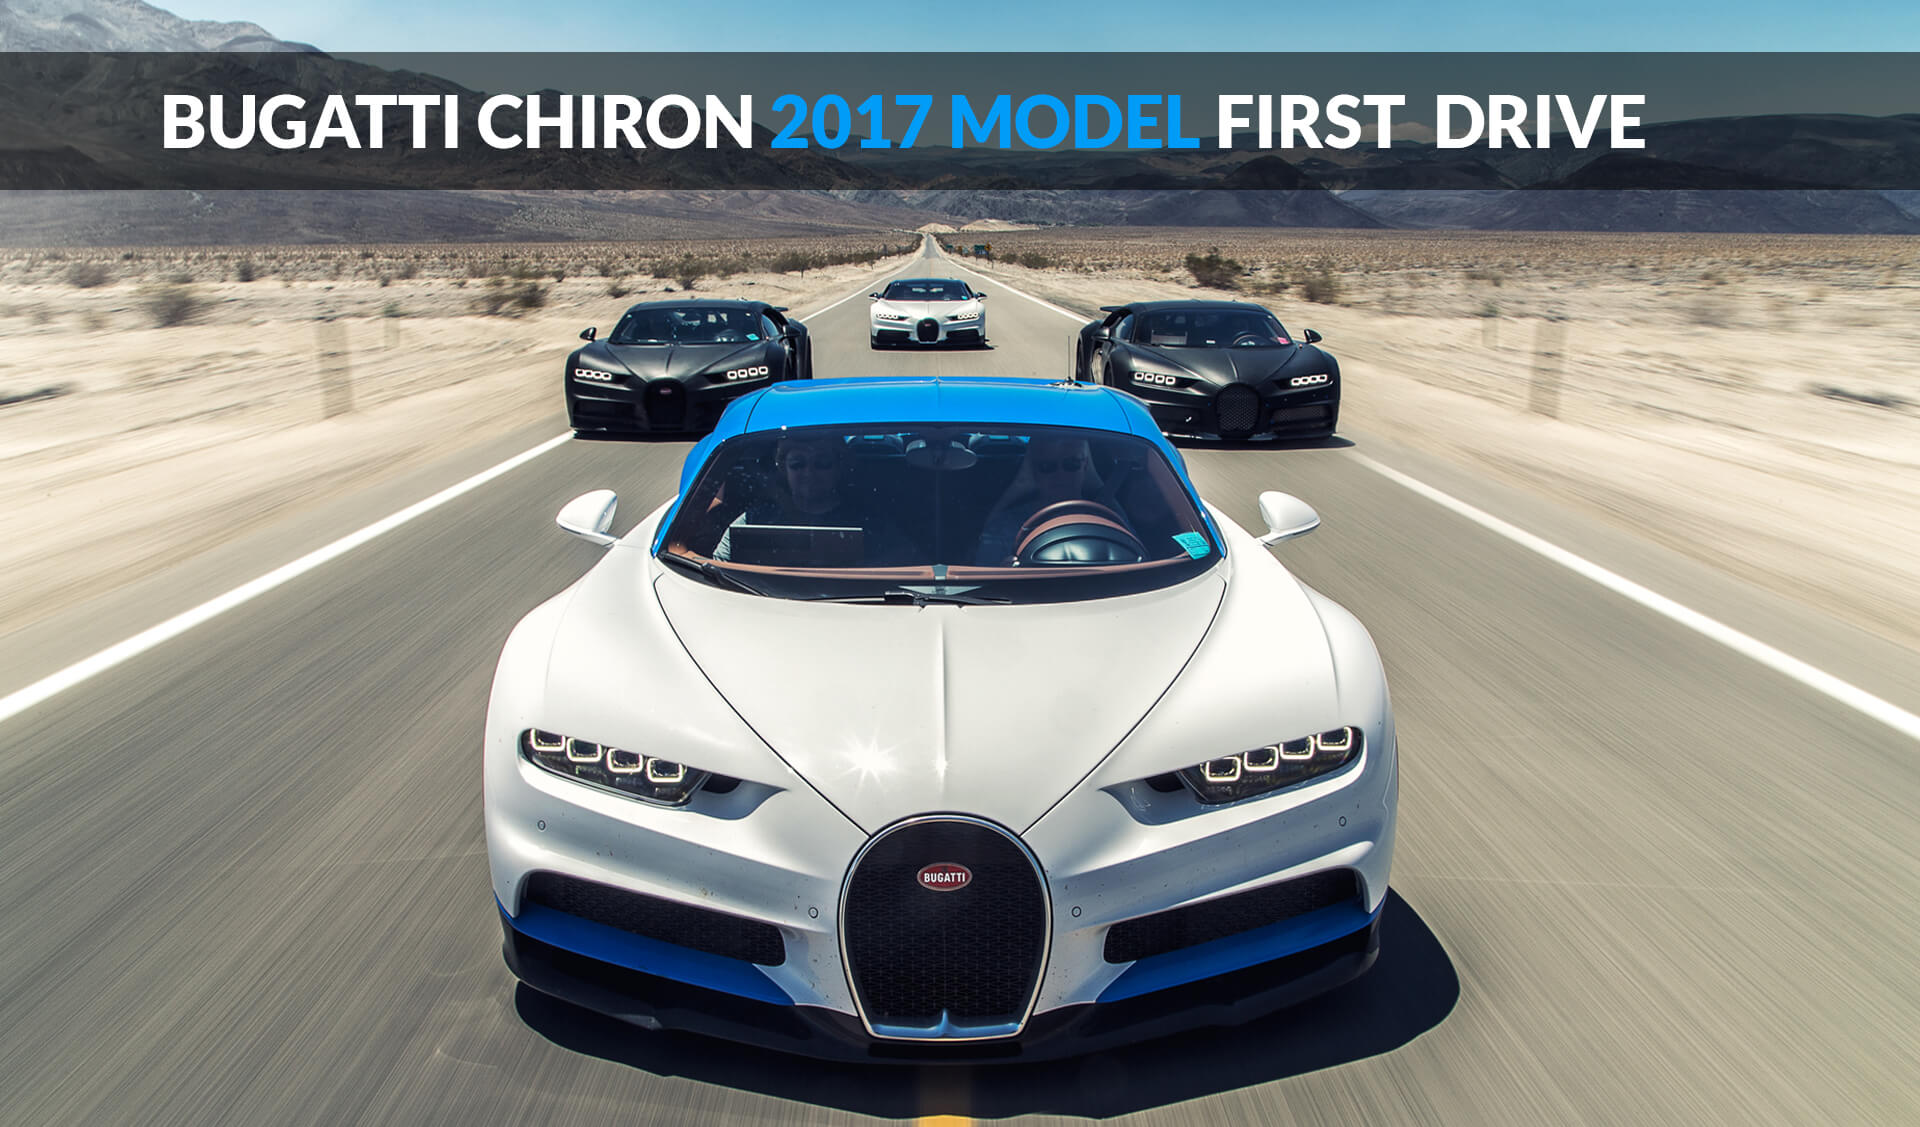 bugatti chiron 2017 model first drive - ebuddynews